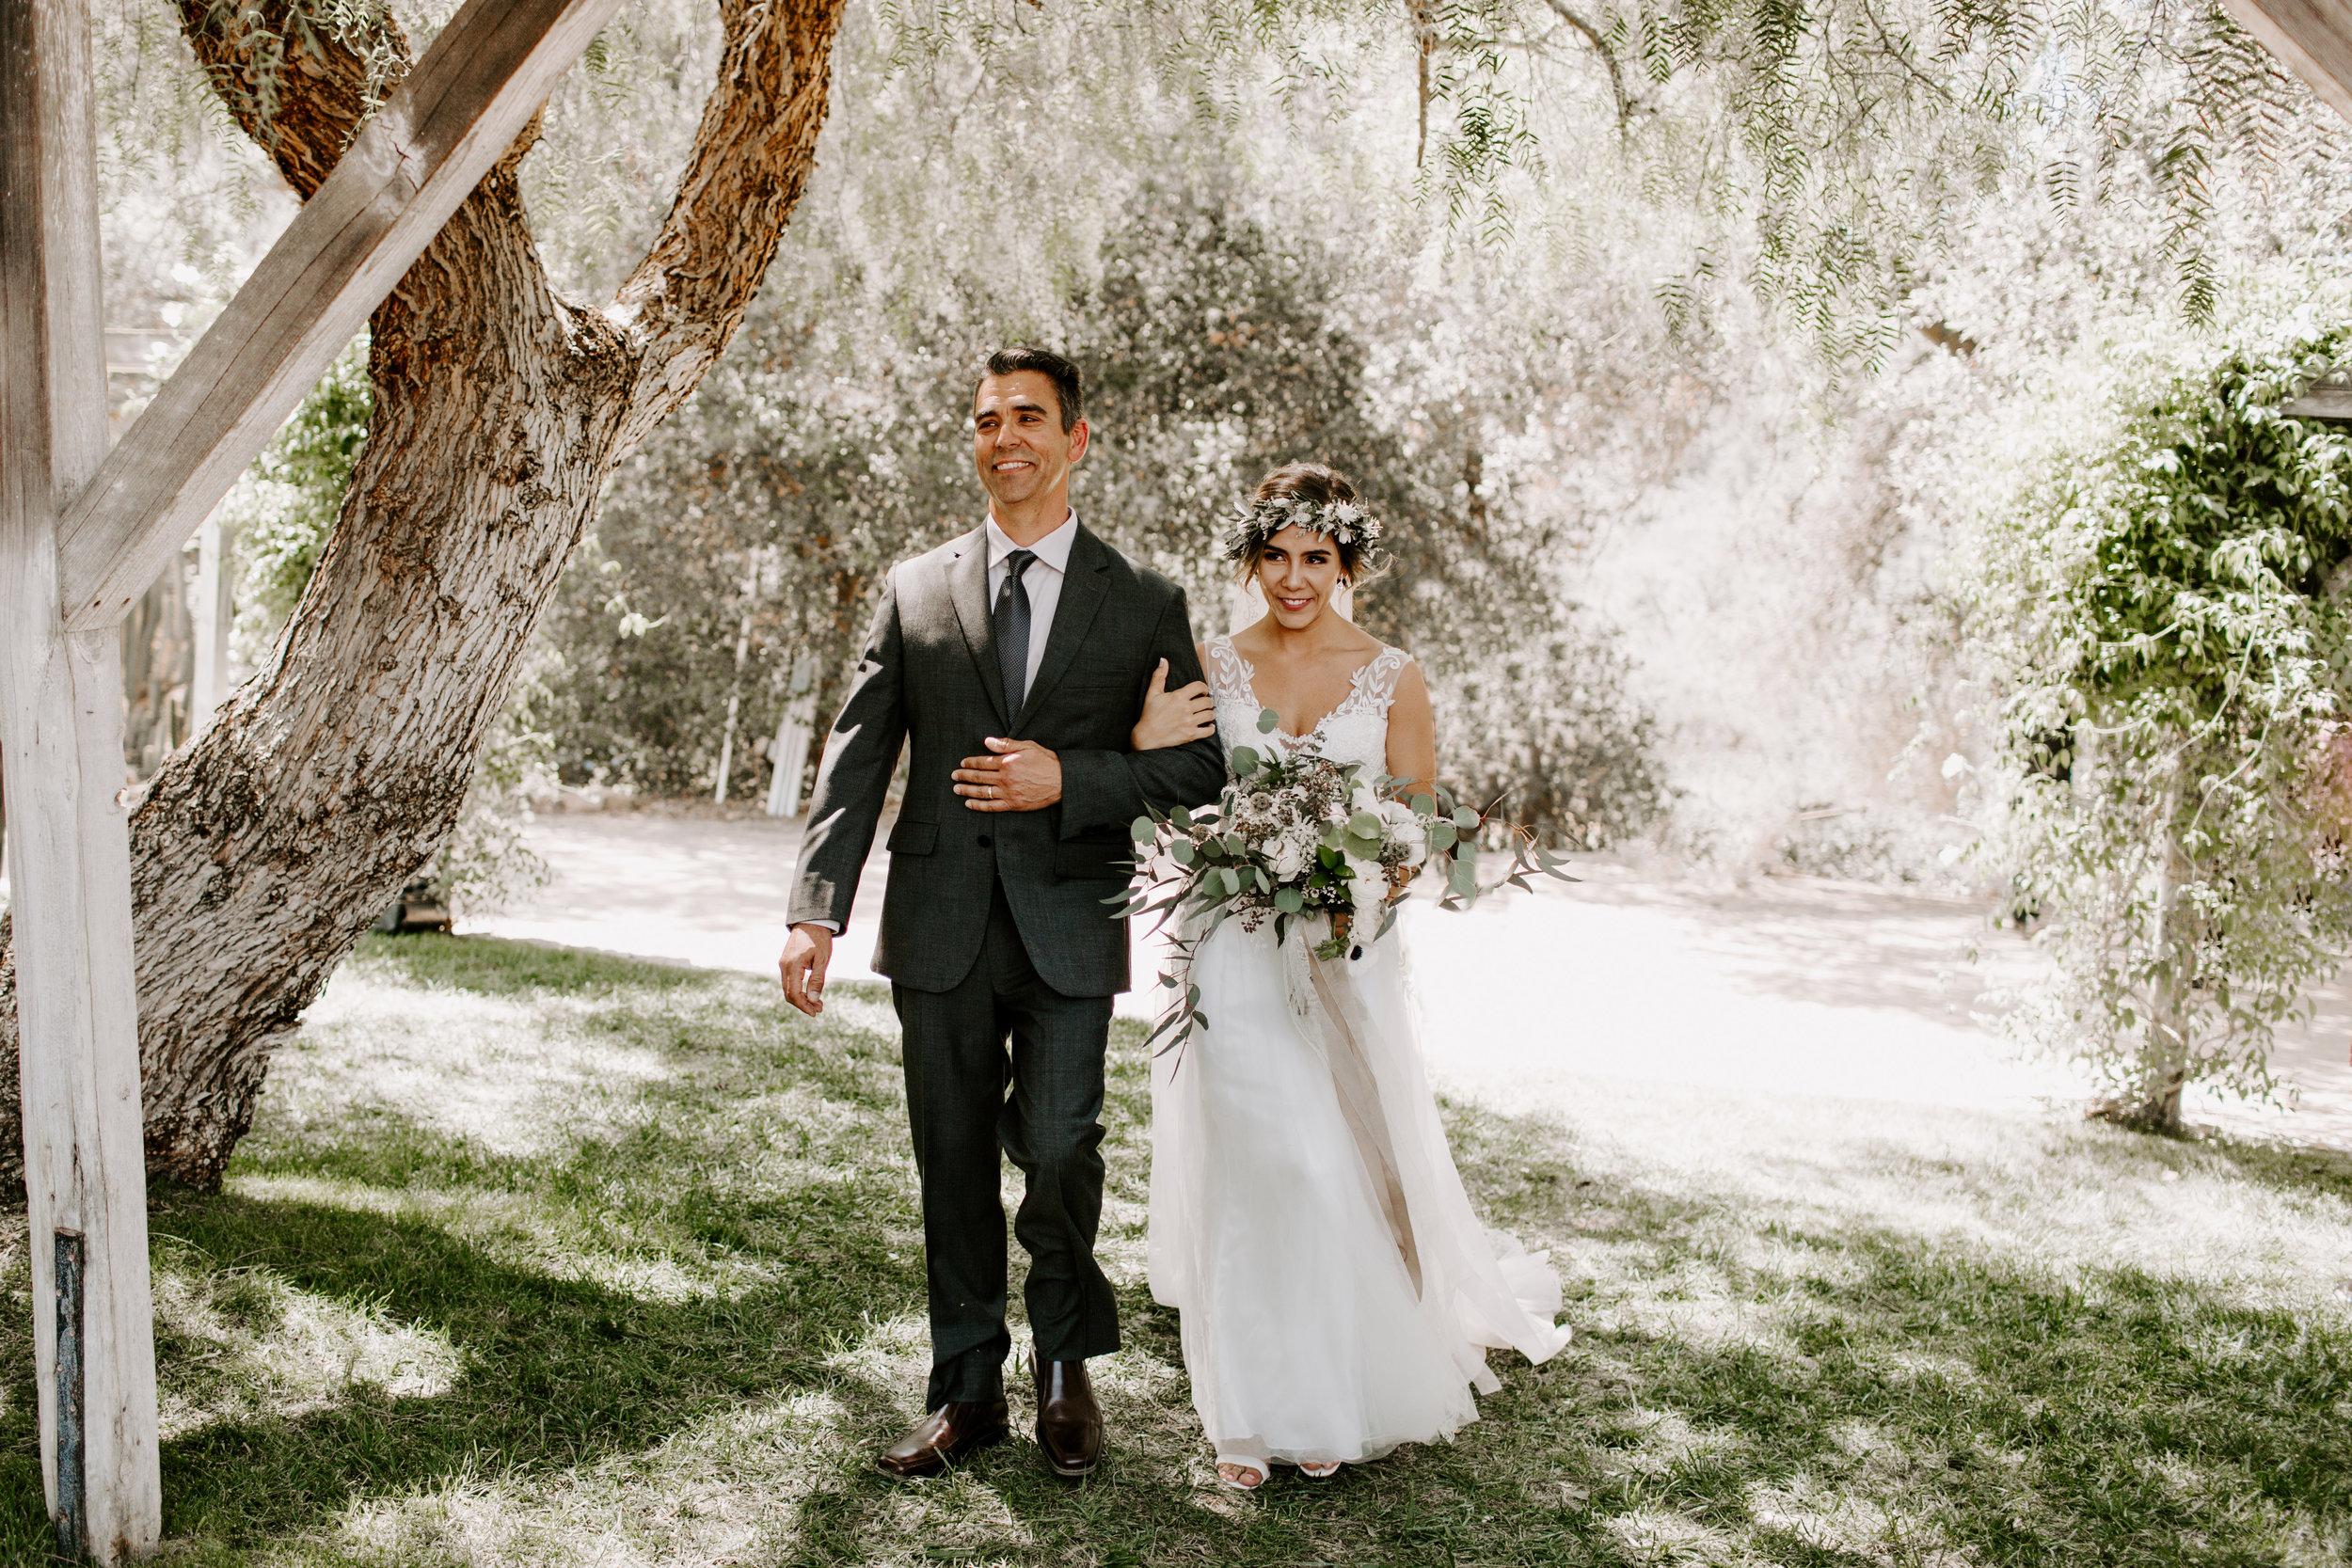 kate+zack_wedding_secludedgardenestate_temecula_madisonrylee_0283.jpg